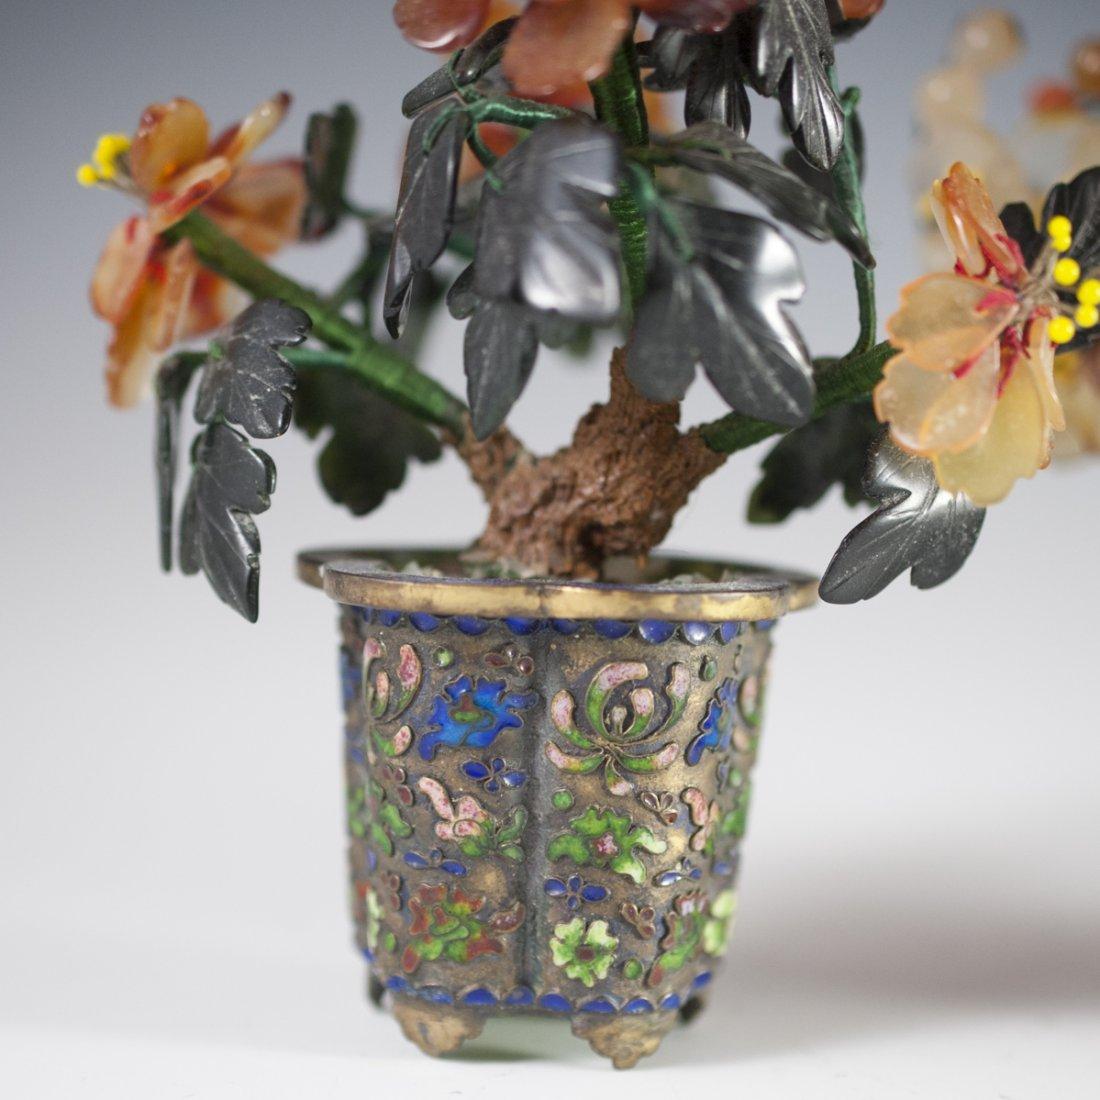 Chinese Enameled Cloissone Agate Bonsai Trees - 7